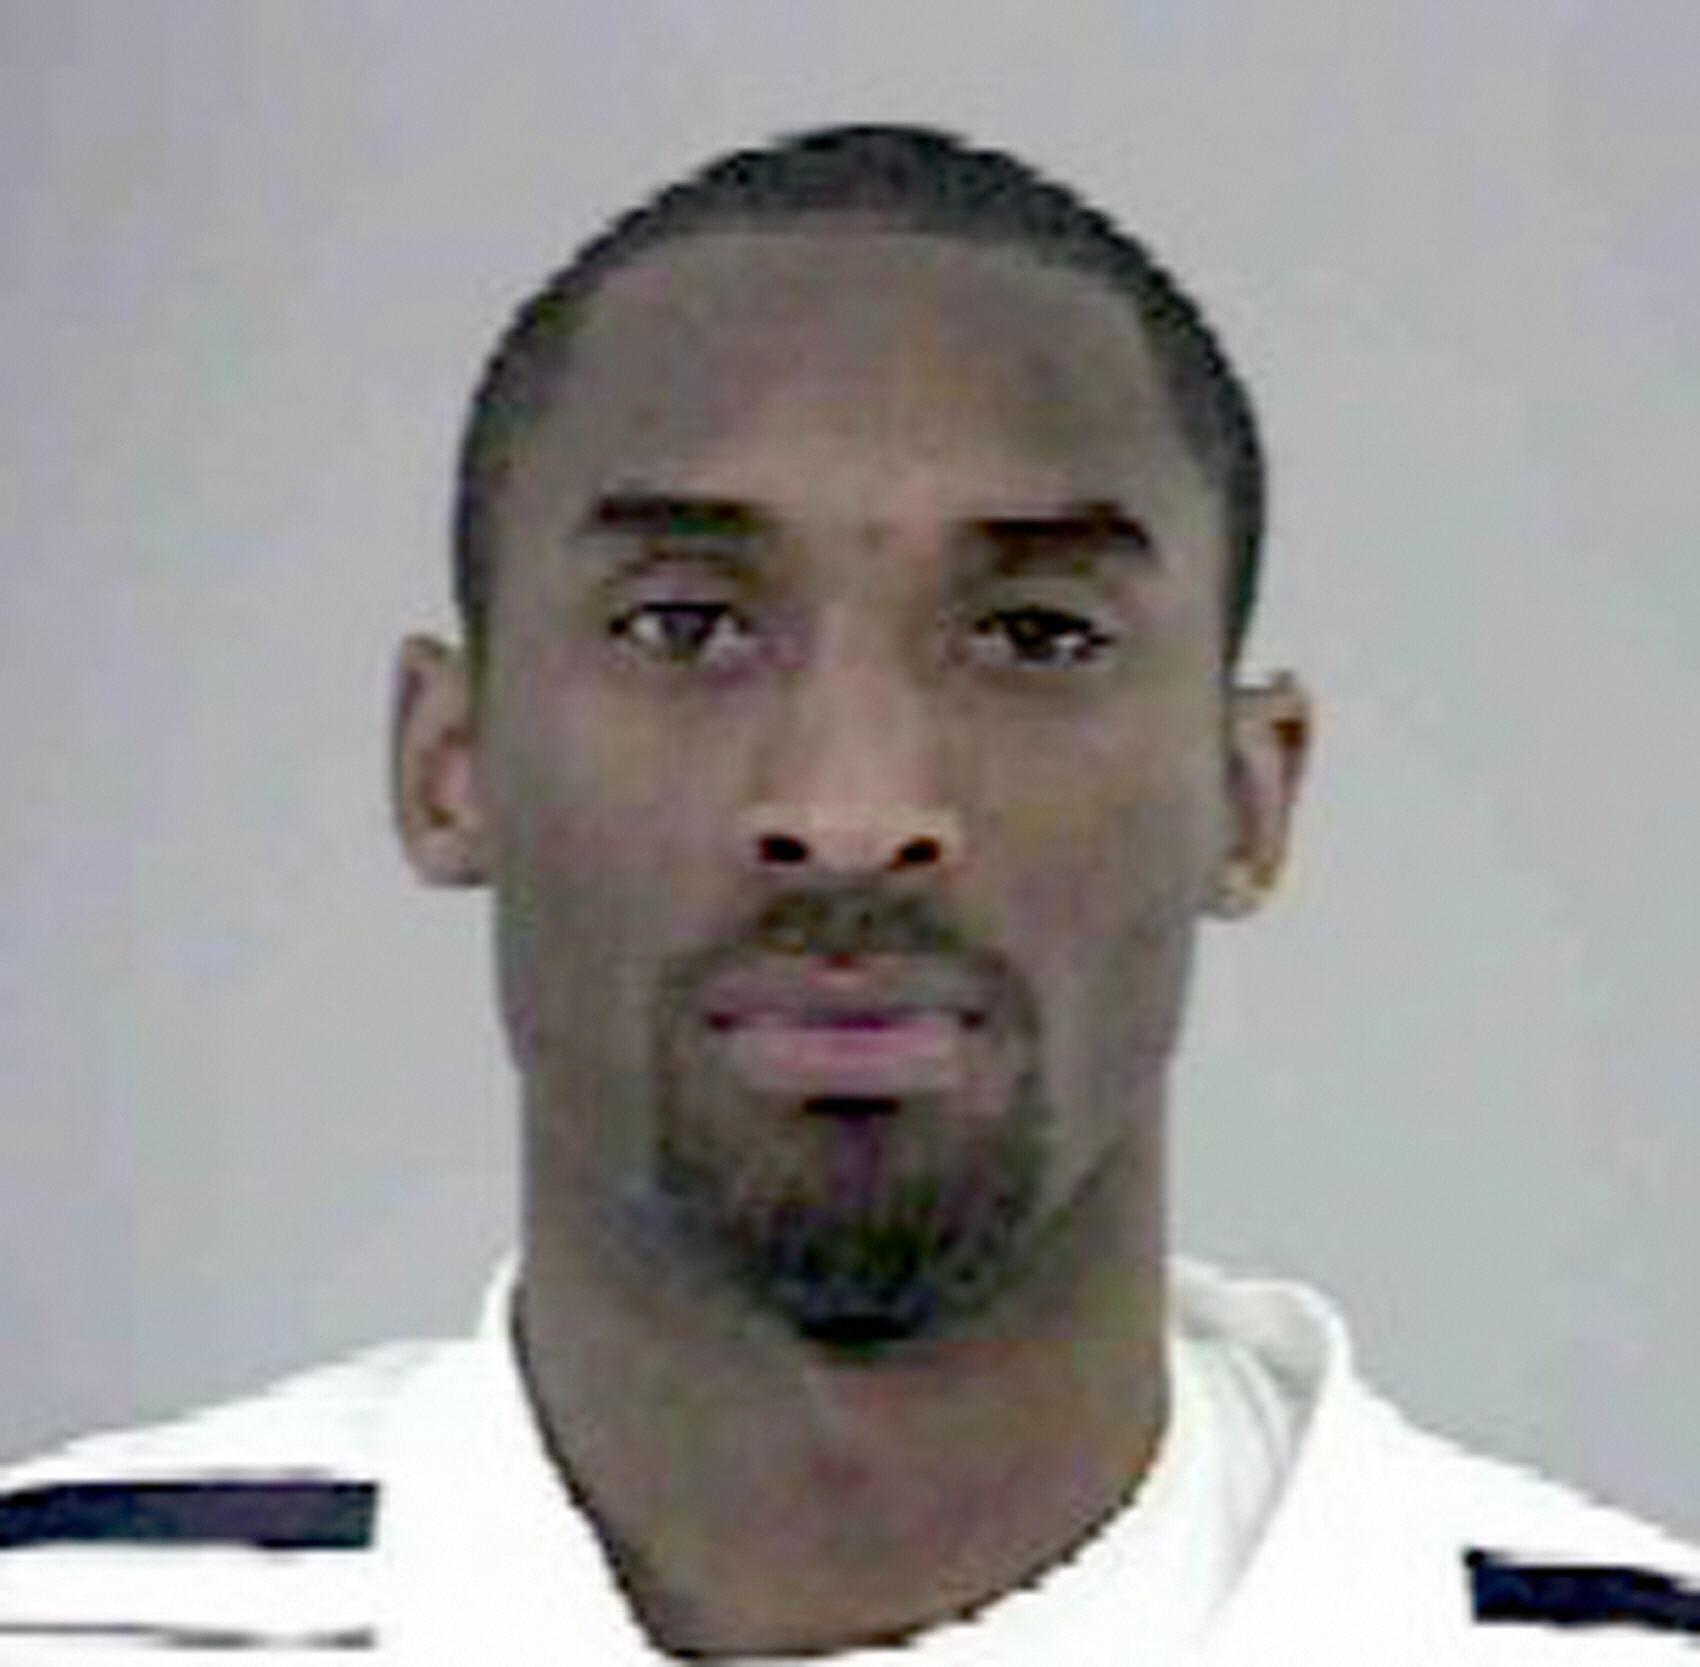 Kobe Bryant Mugshot